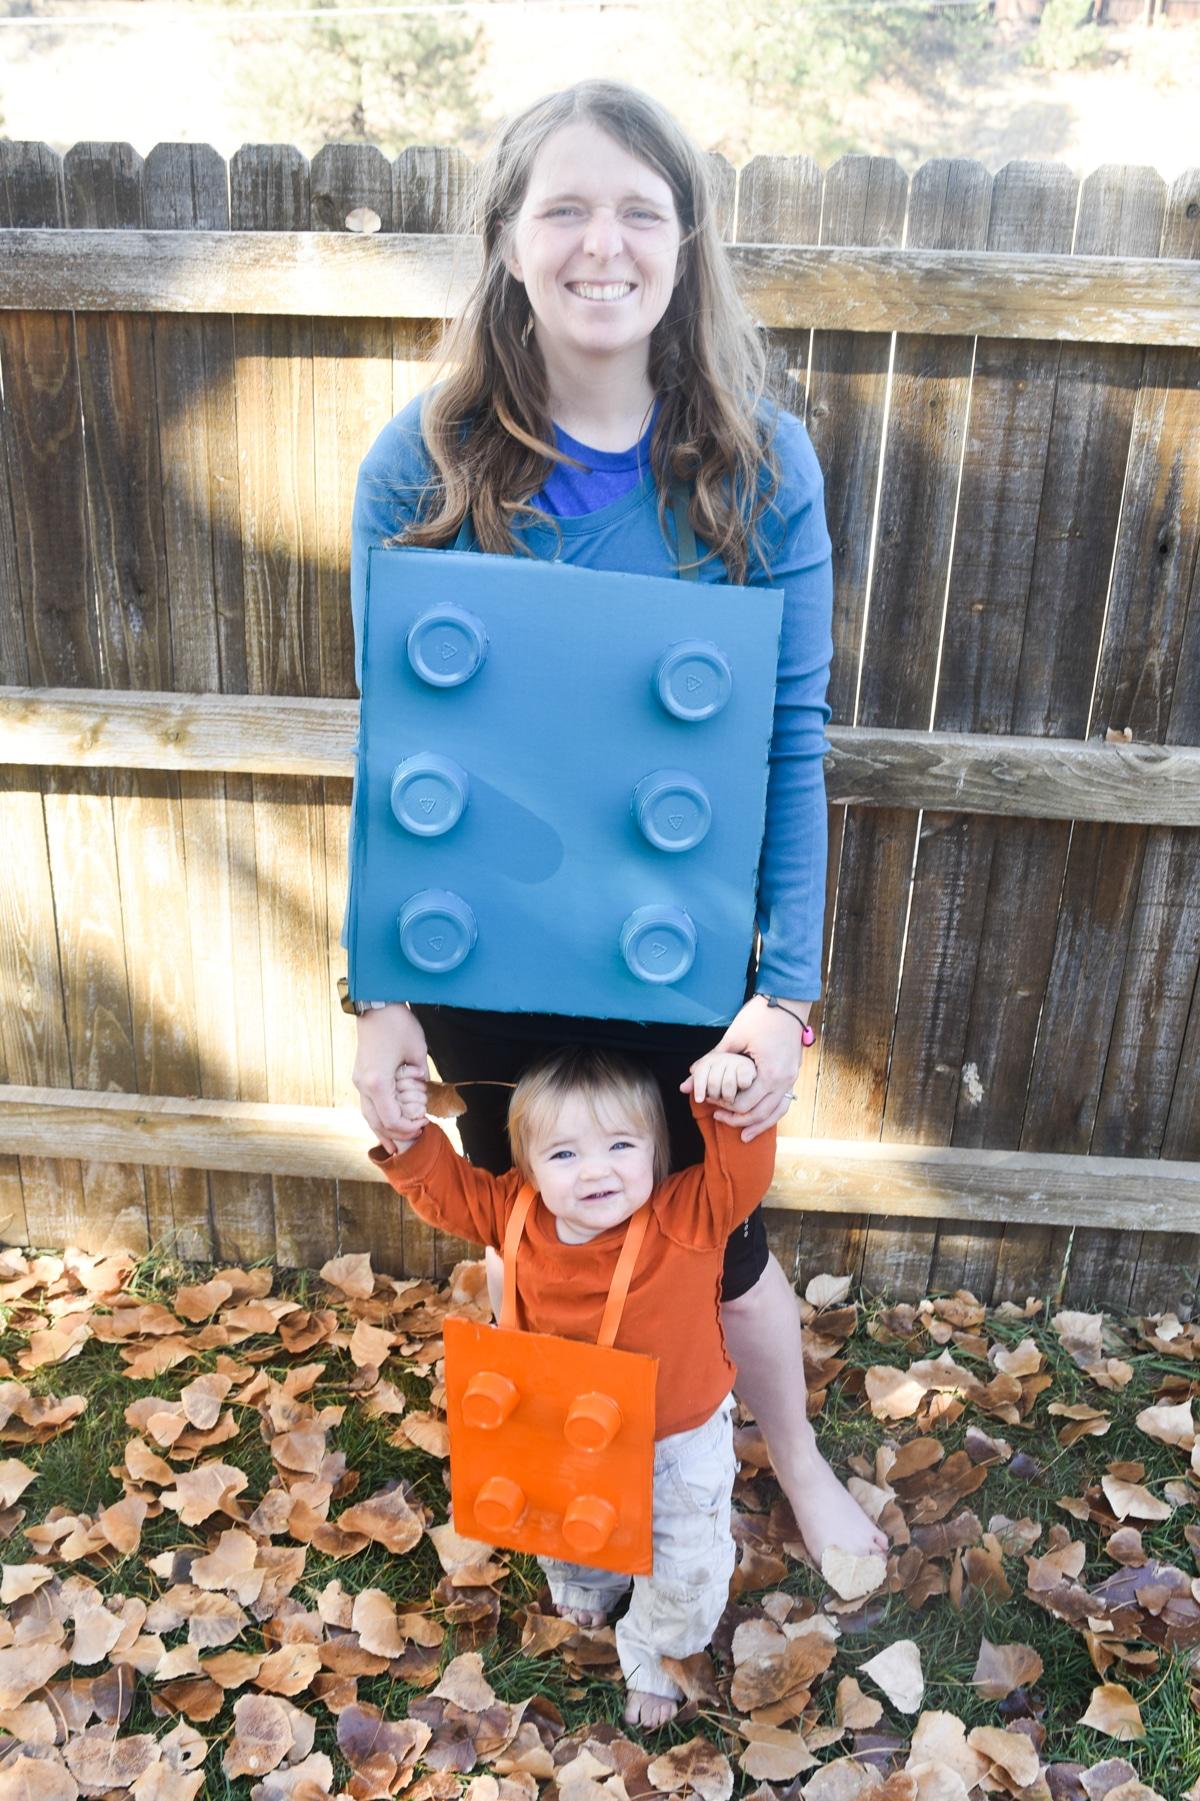 DIY LEGO Costume - mom and son